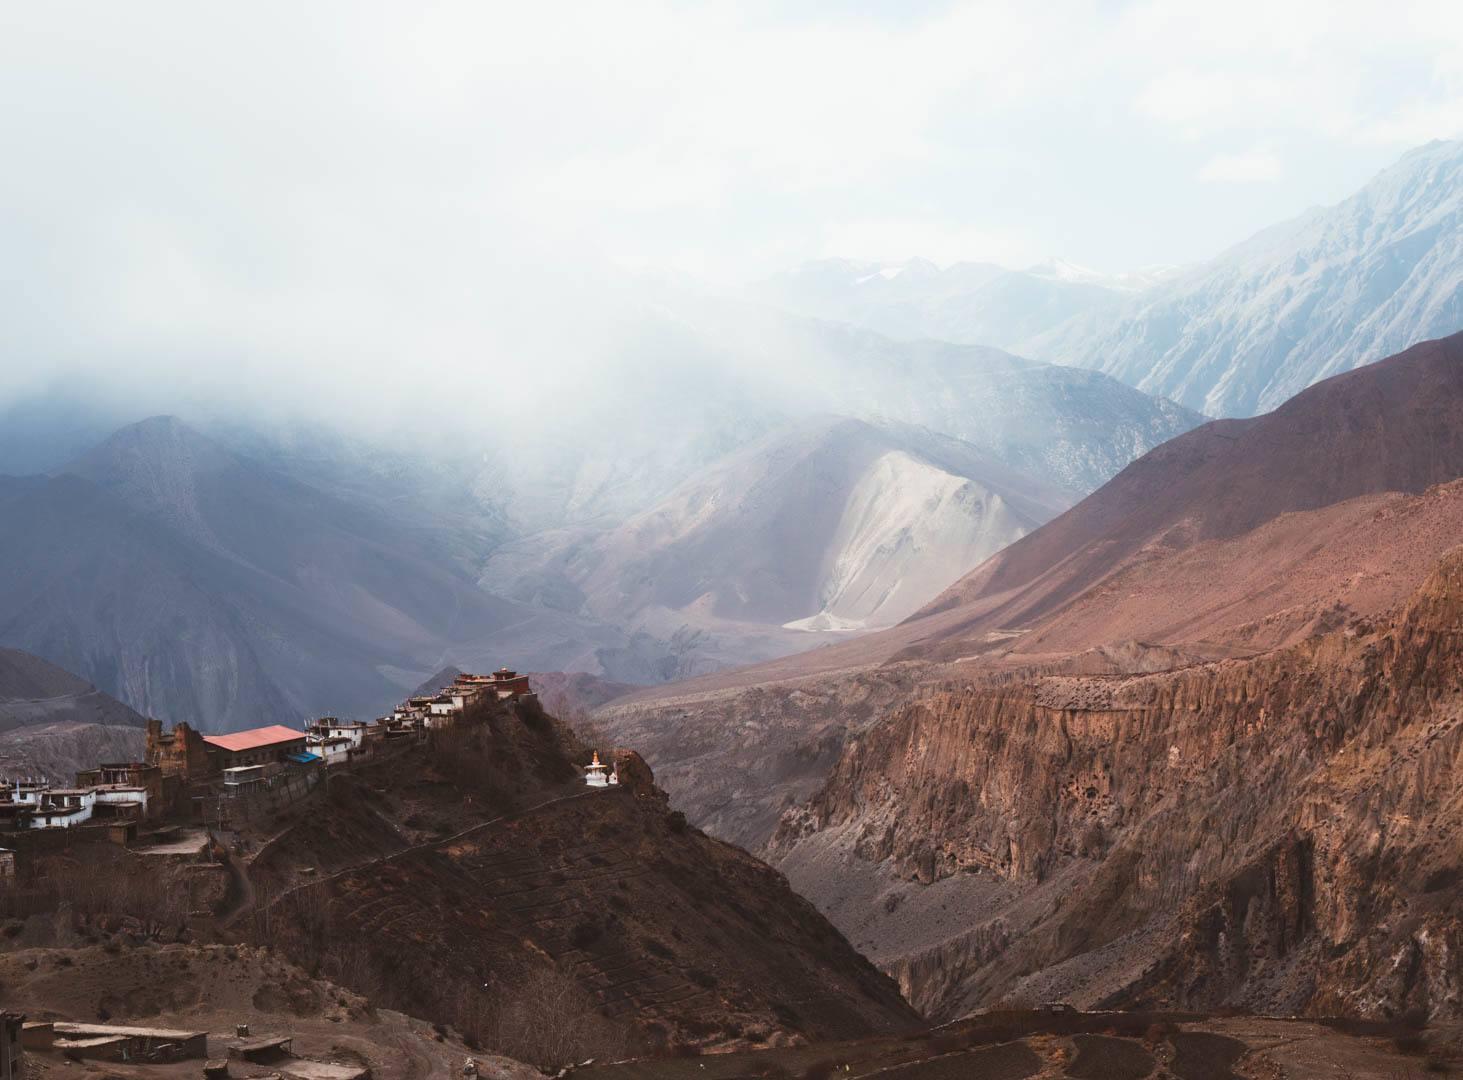 Views of the Mustang Region in Nepal